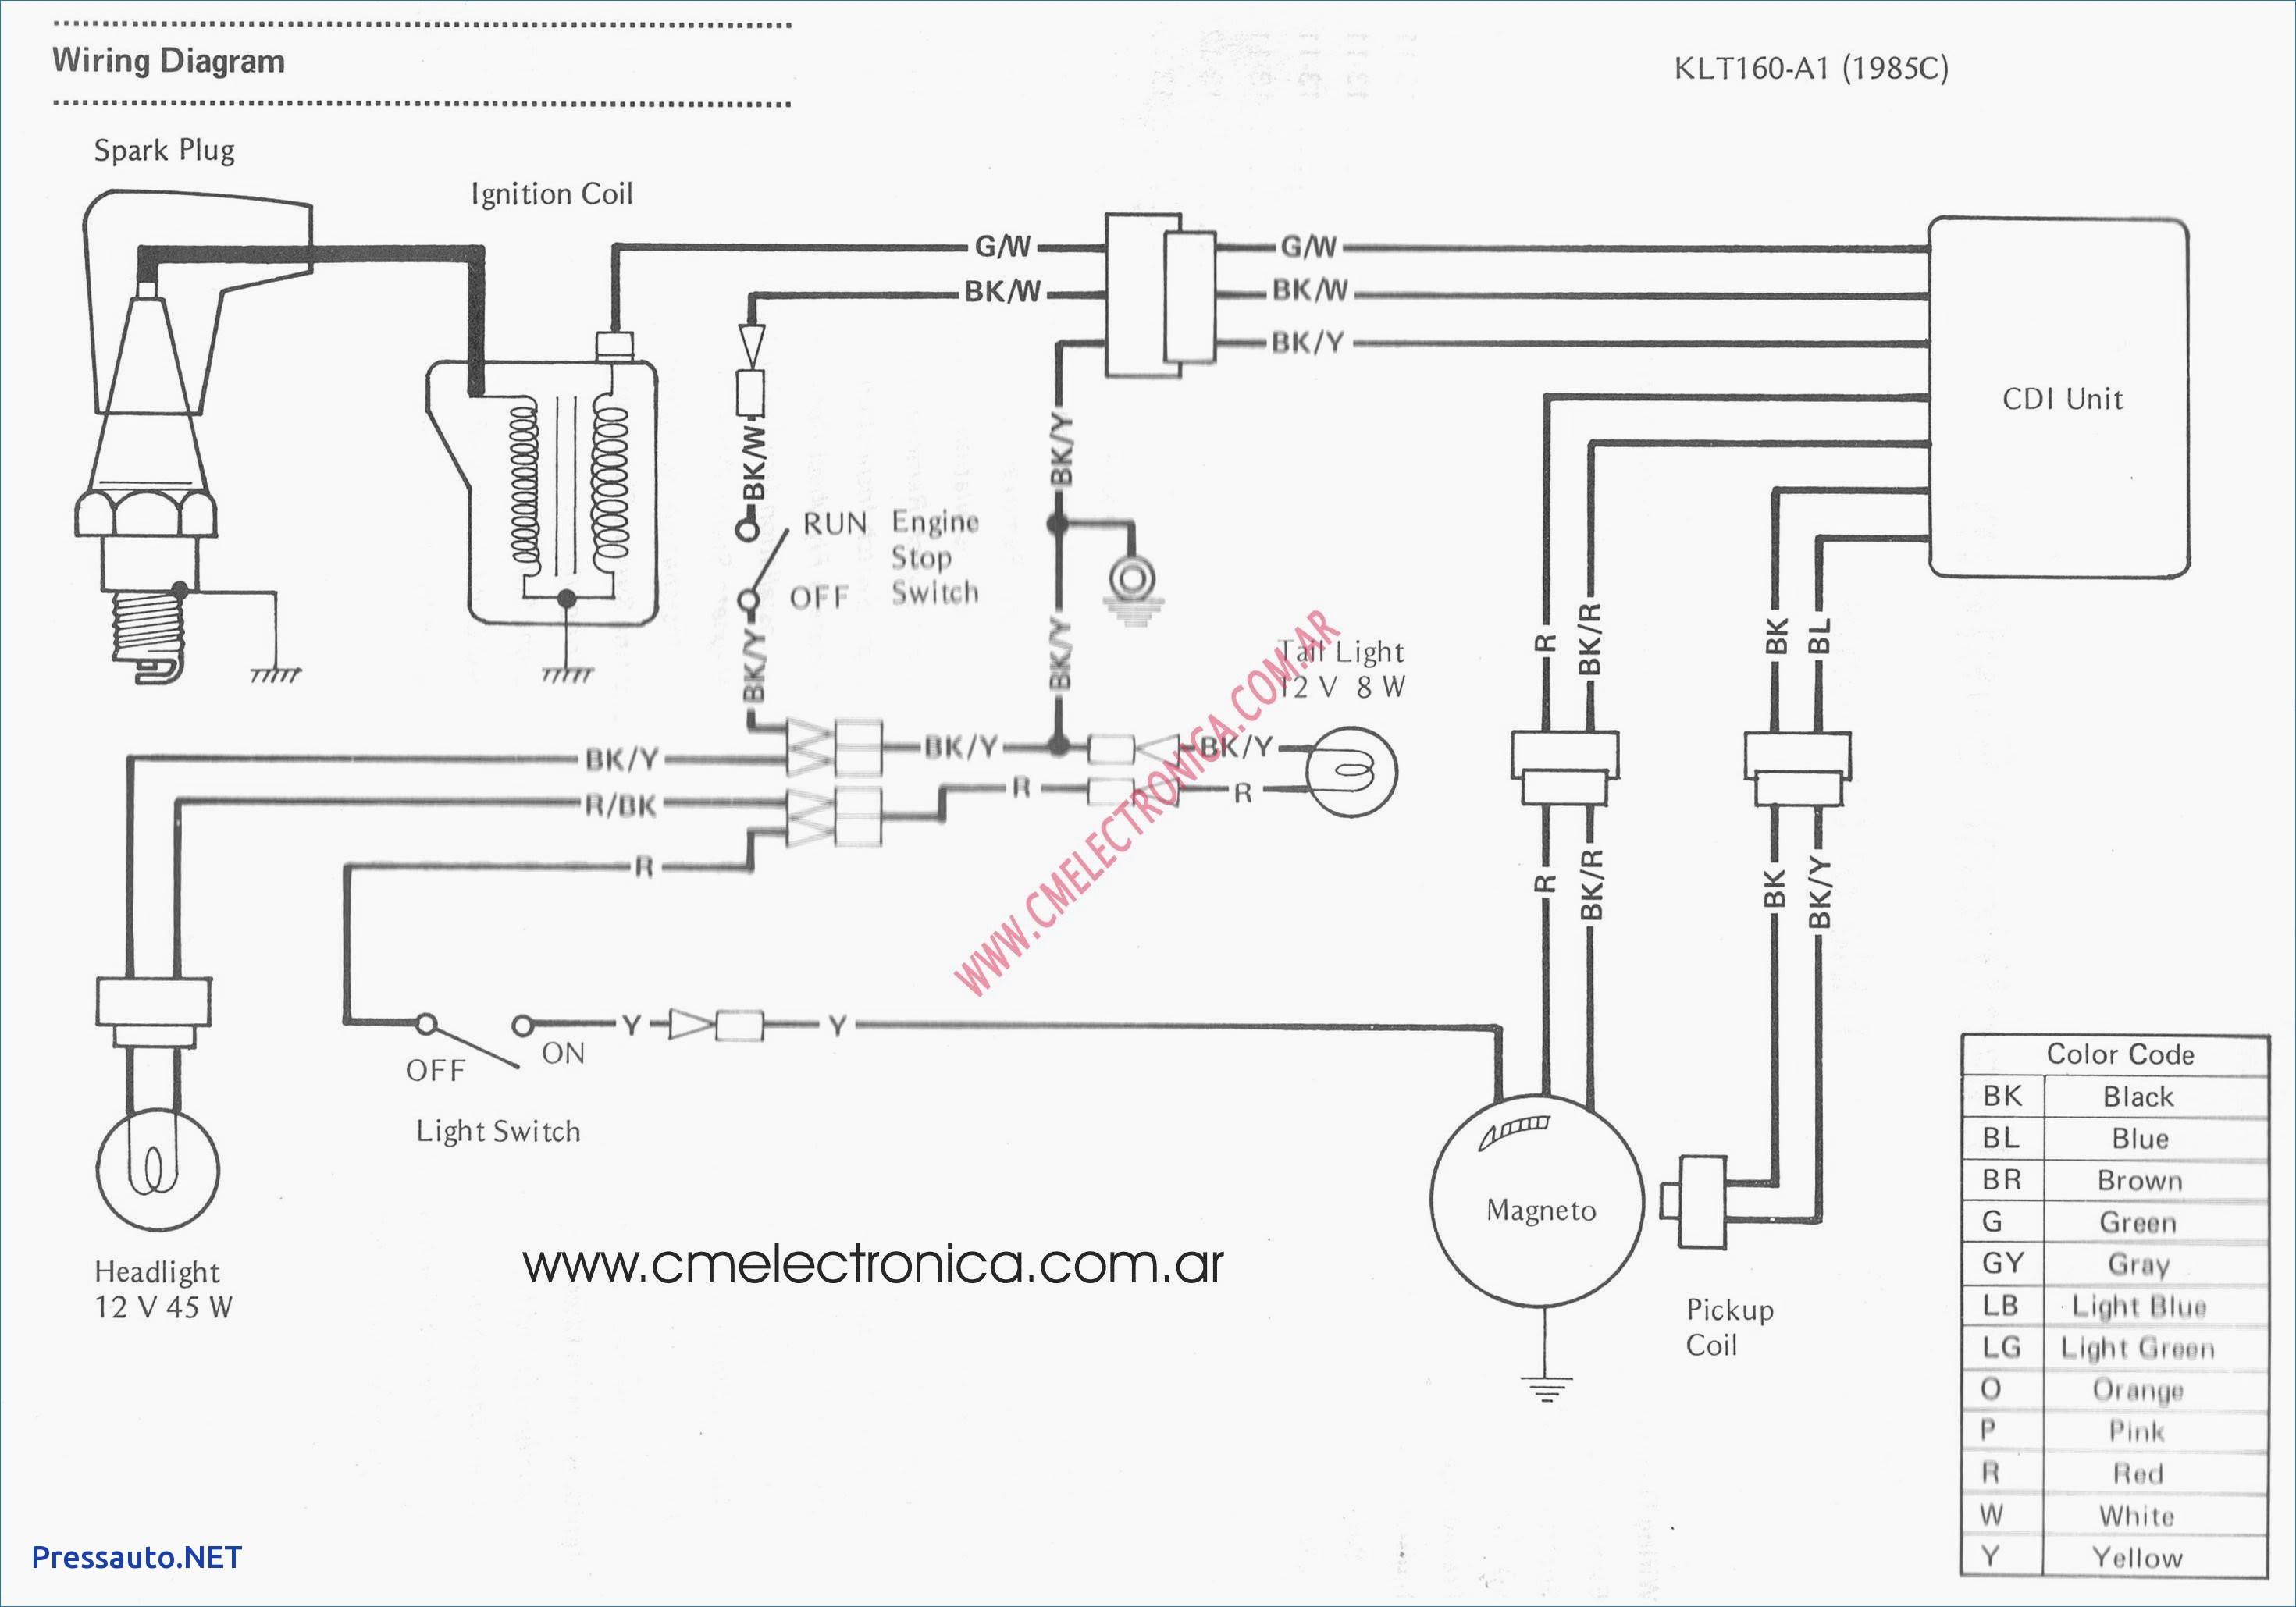 DIAGRAM] Massey Ferguson 175 Diesel Wiring Diagram FULL Version HD Quality Wiring  Diagram - FREEZEWIRING8018.CONTOROCK.ITCONTO ROCK